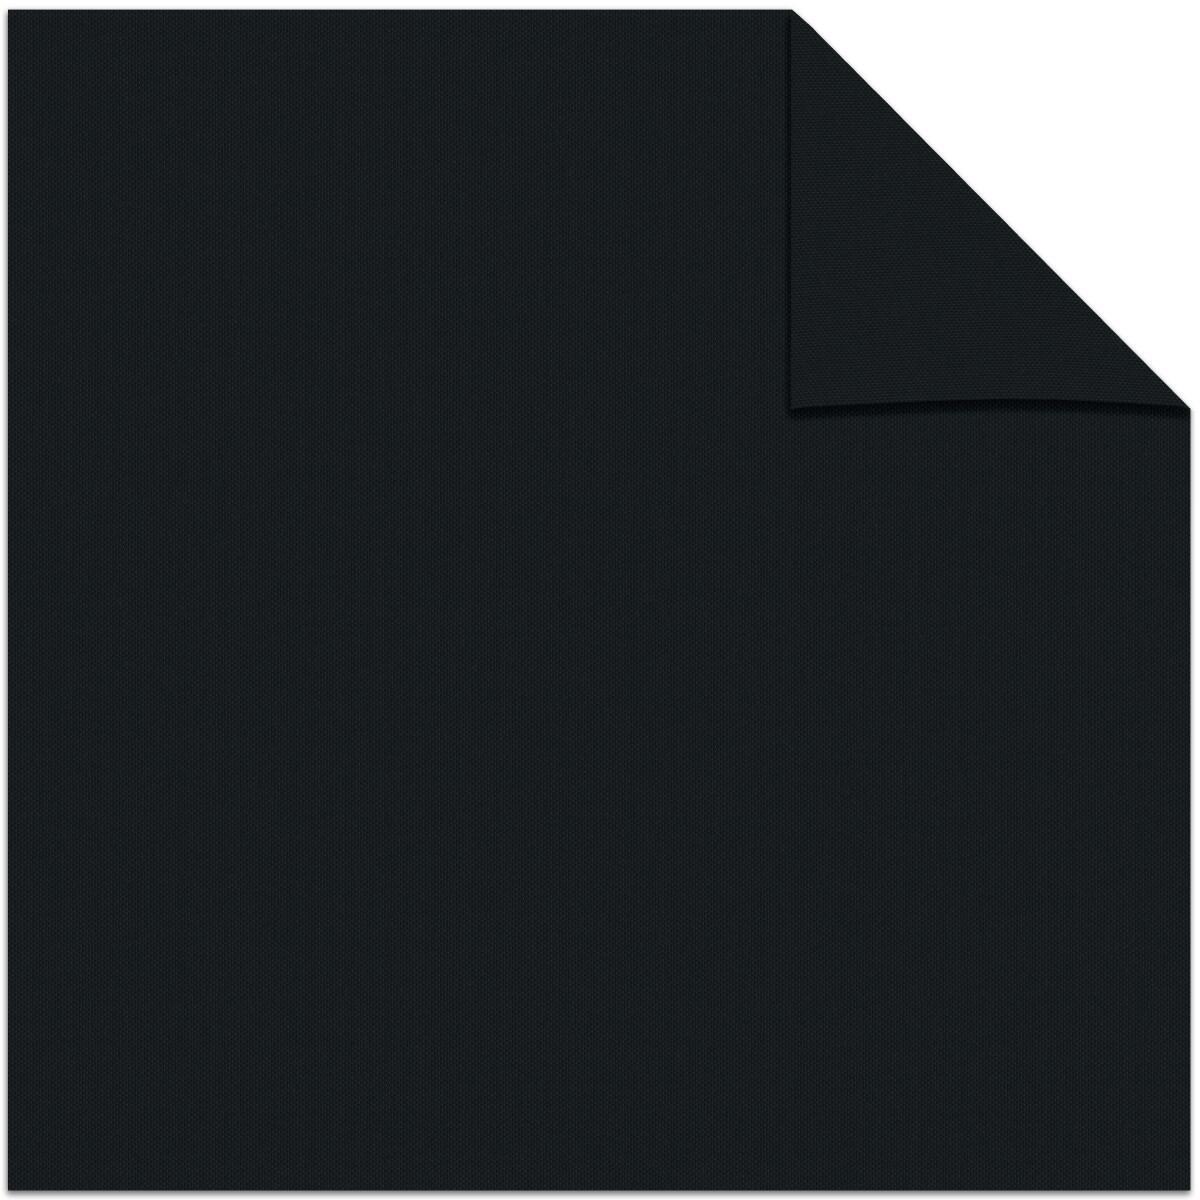 Tenda a rullo oscurante Dublin nero 60 x 190 cm - 4